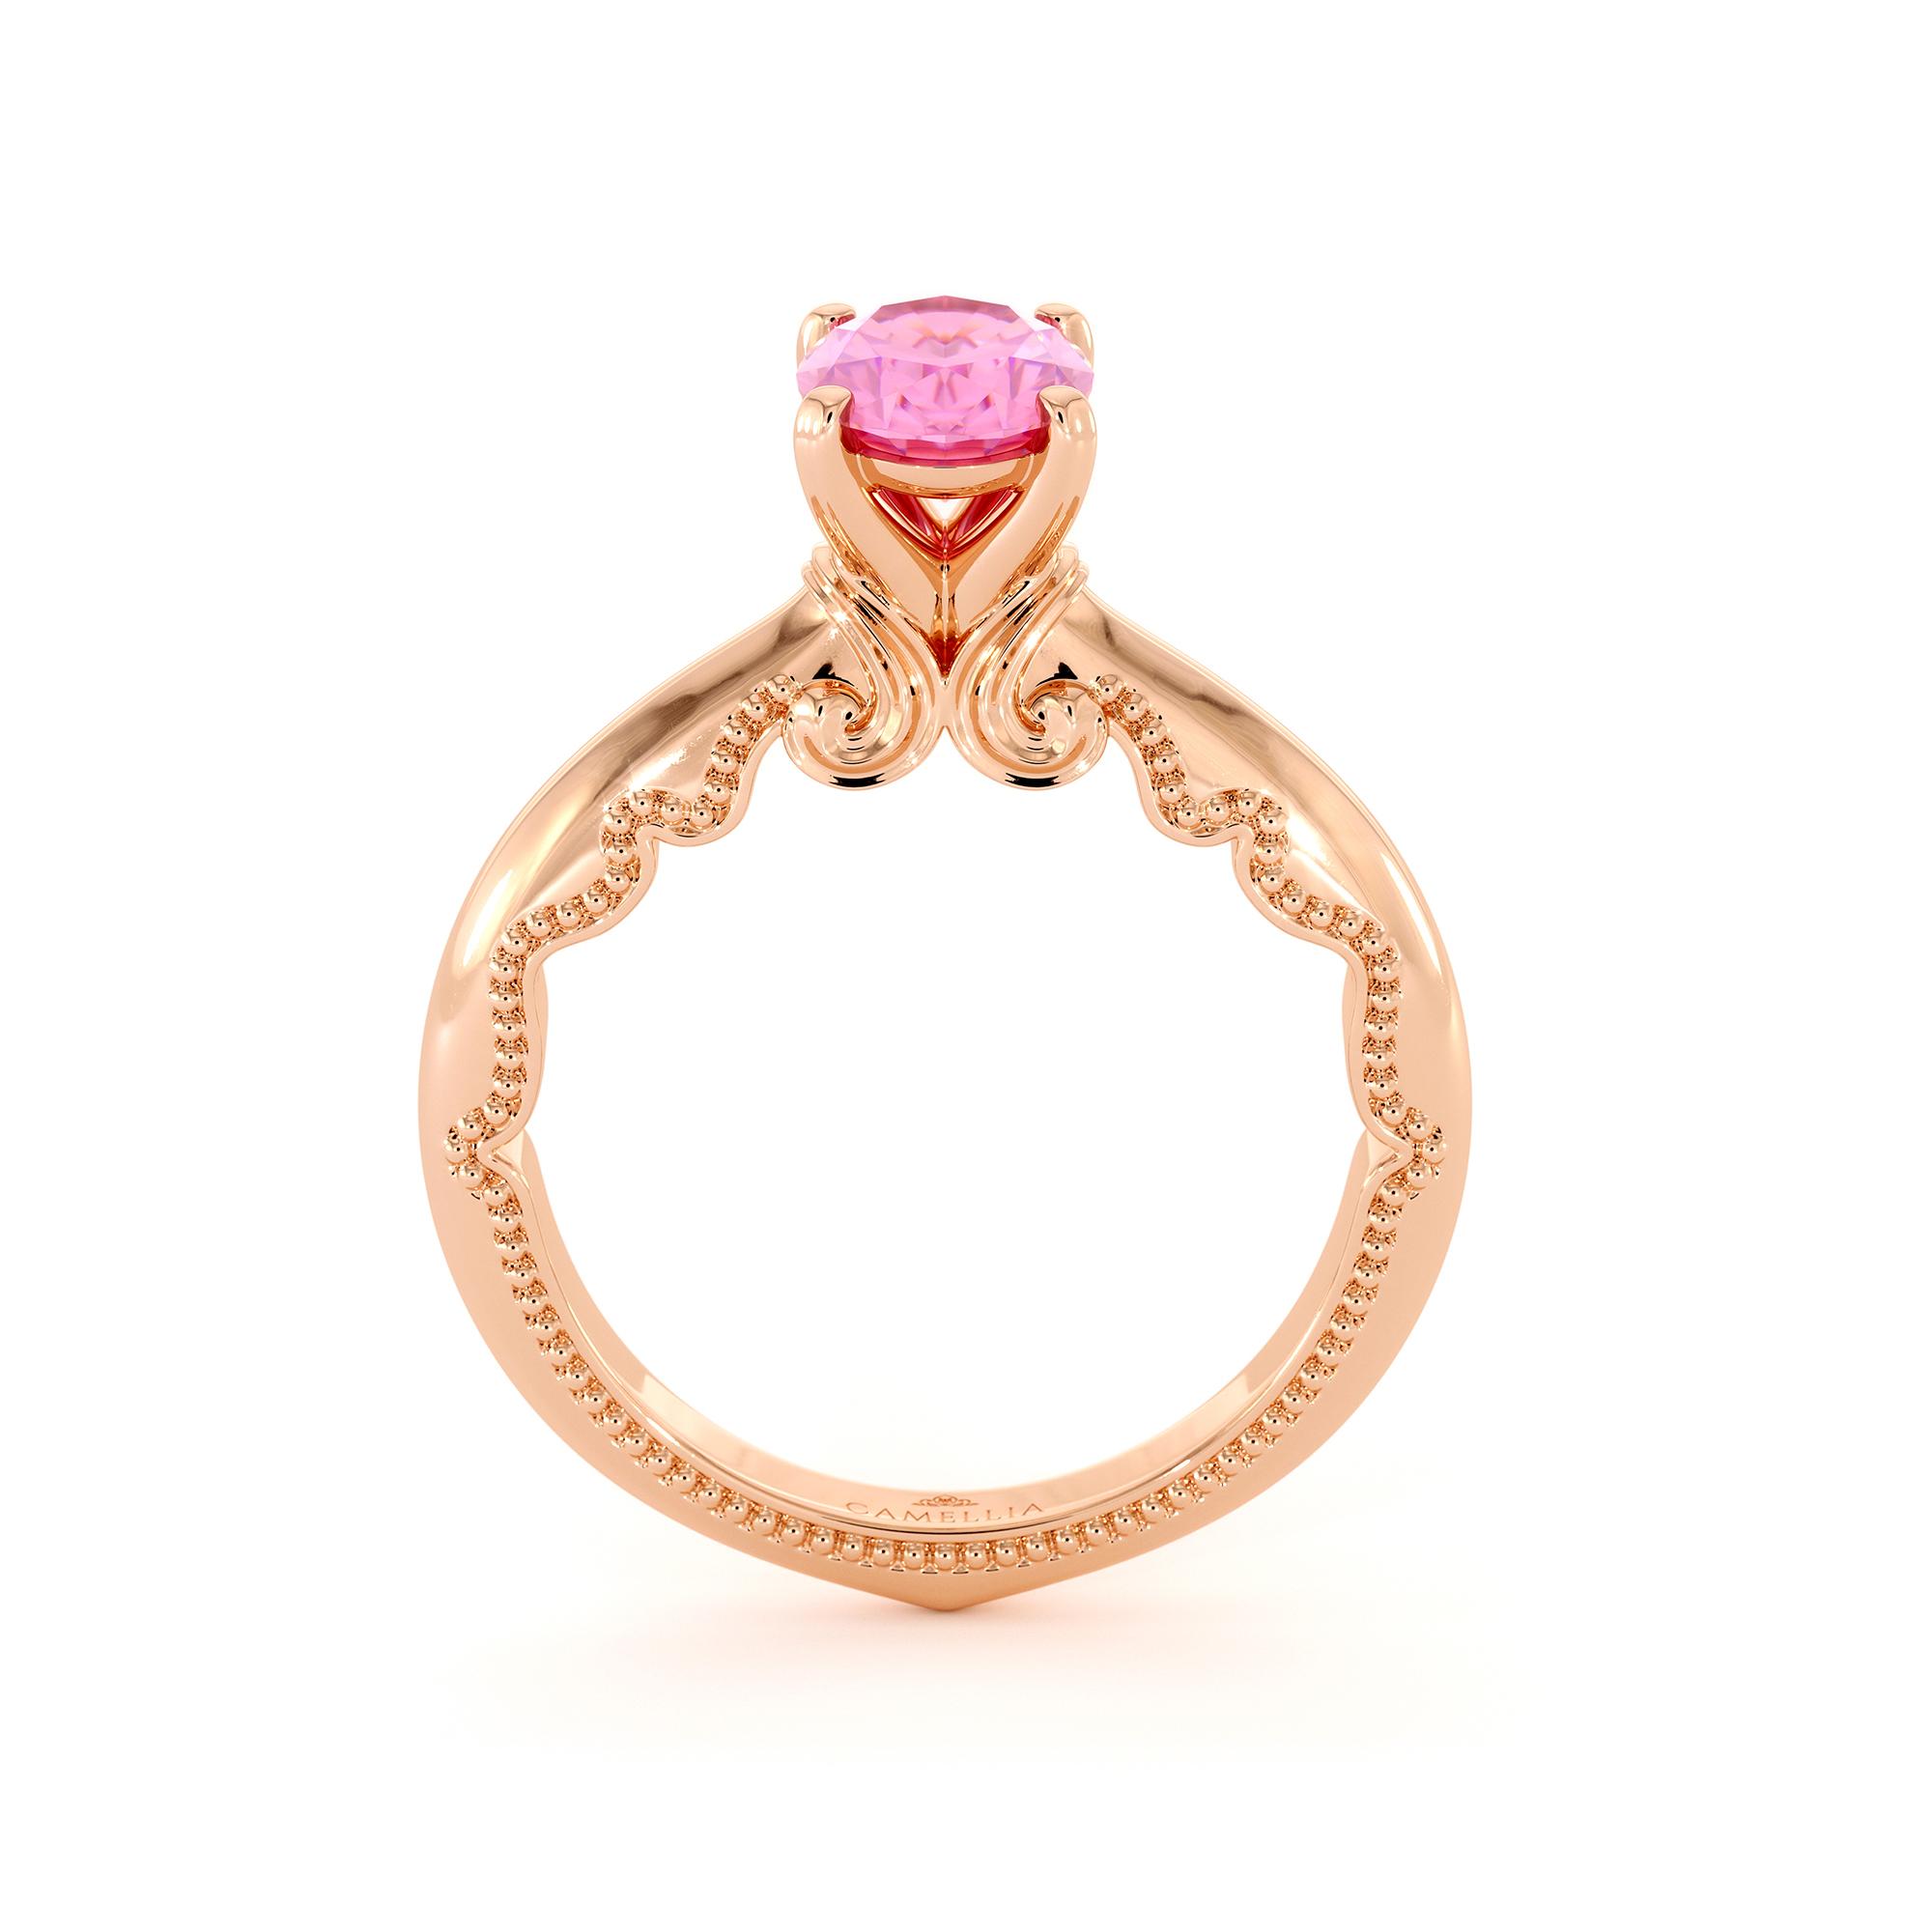 Natural Pink Sapphire Ring Rose Gold Milgrain Ring Oval Pink Sapphire Engagement Ring